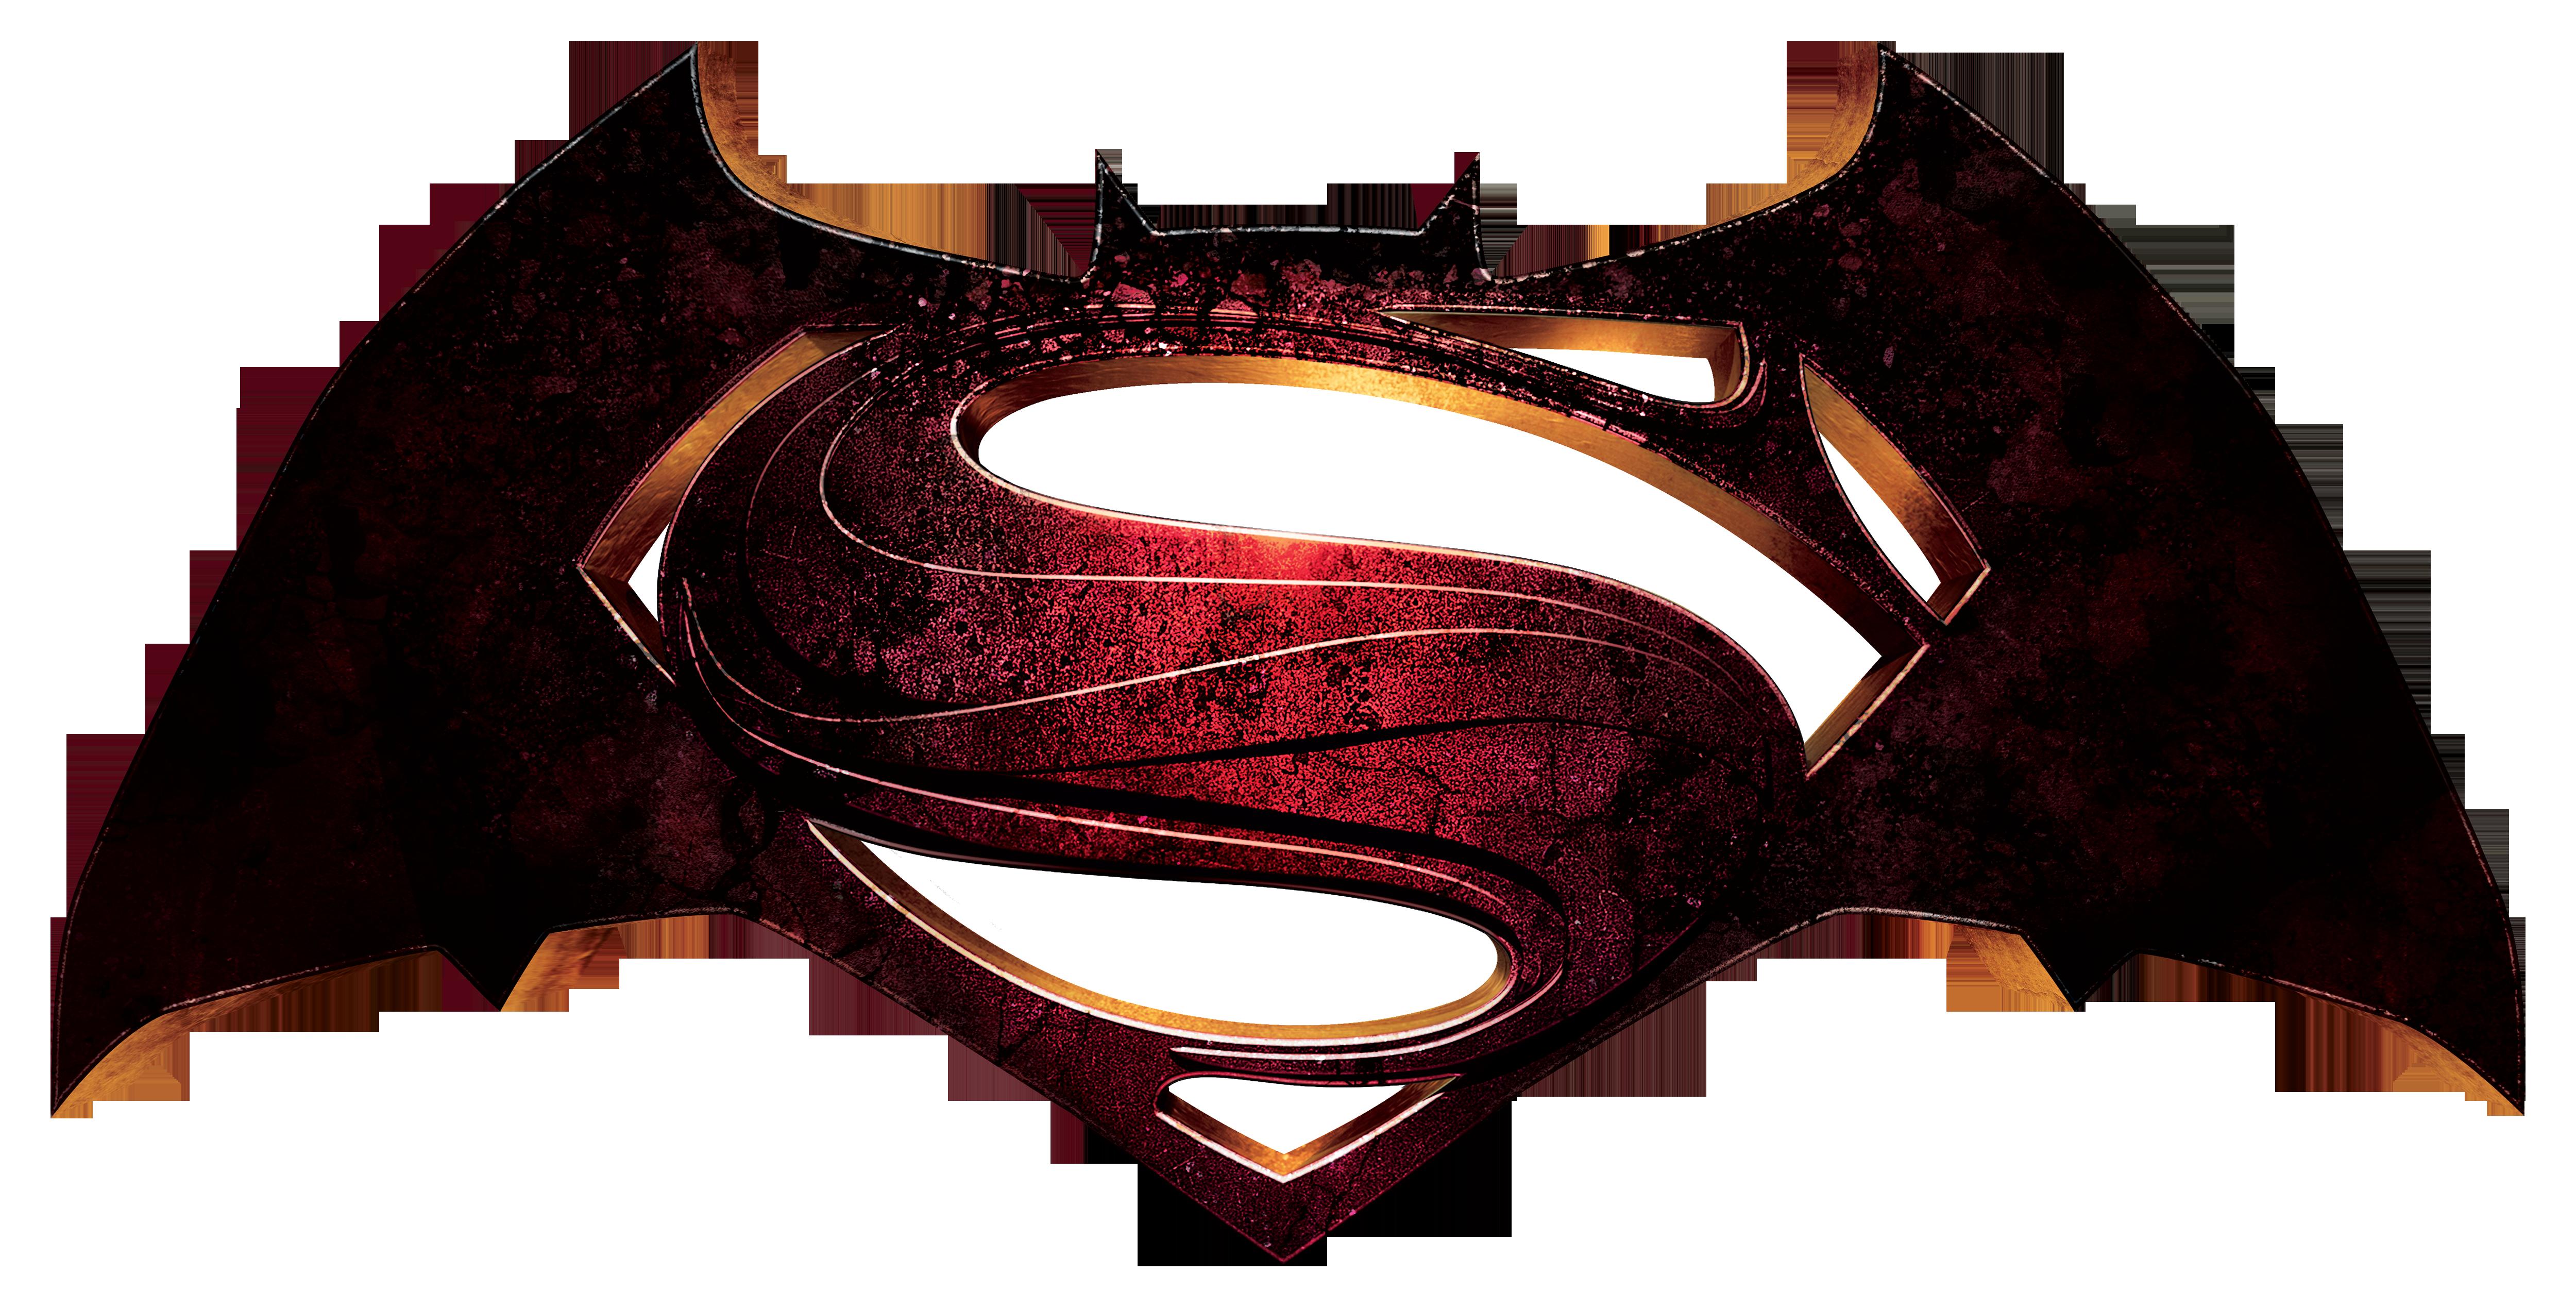 Batman vs joker clipart graphic freeuse download Superman vs batman clipart - ClipartFest graphic freeuse download